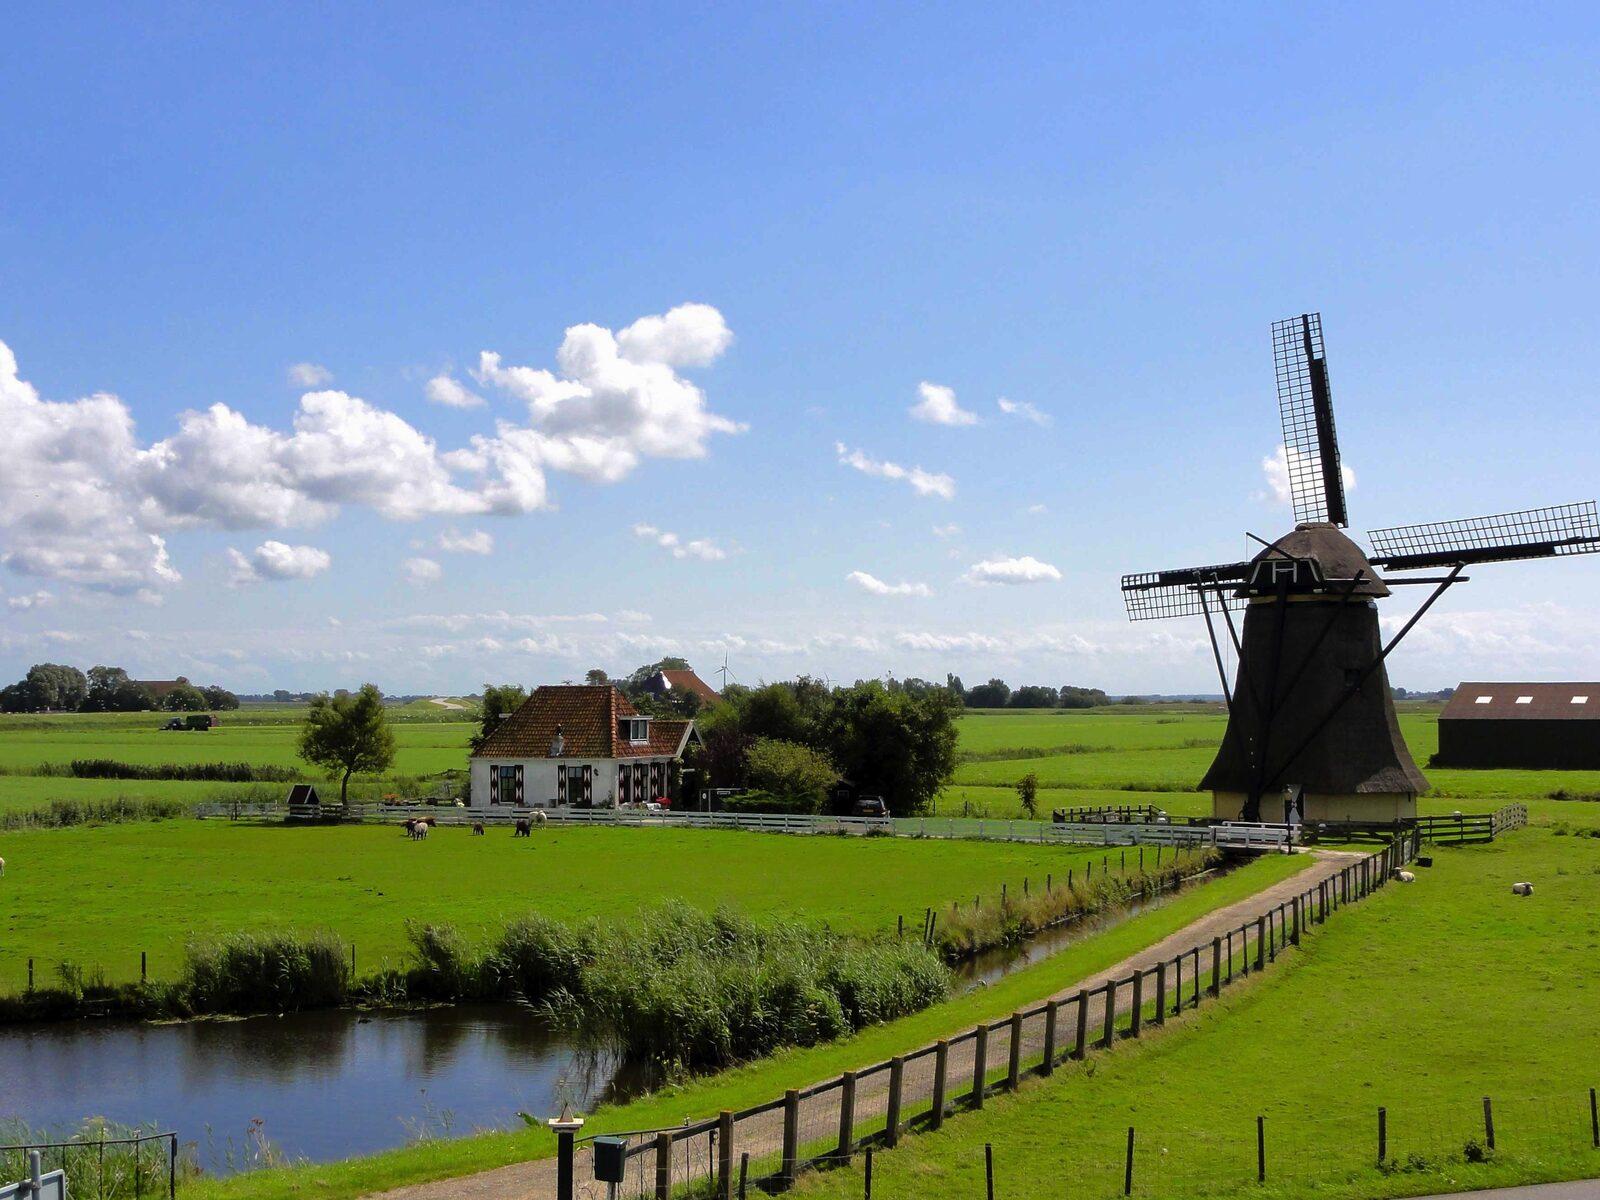 Safaritent Nederland